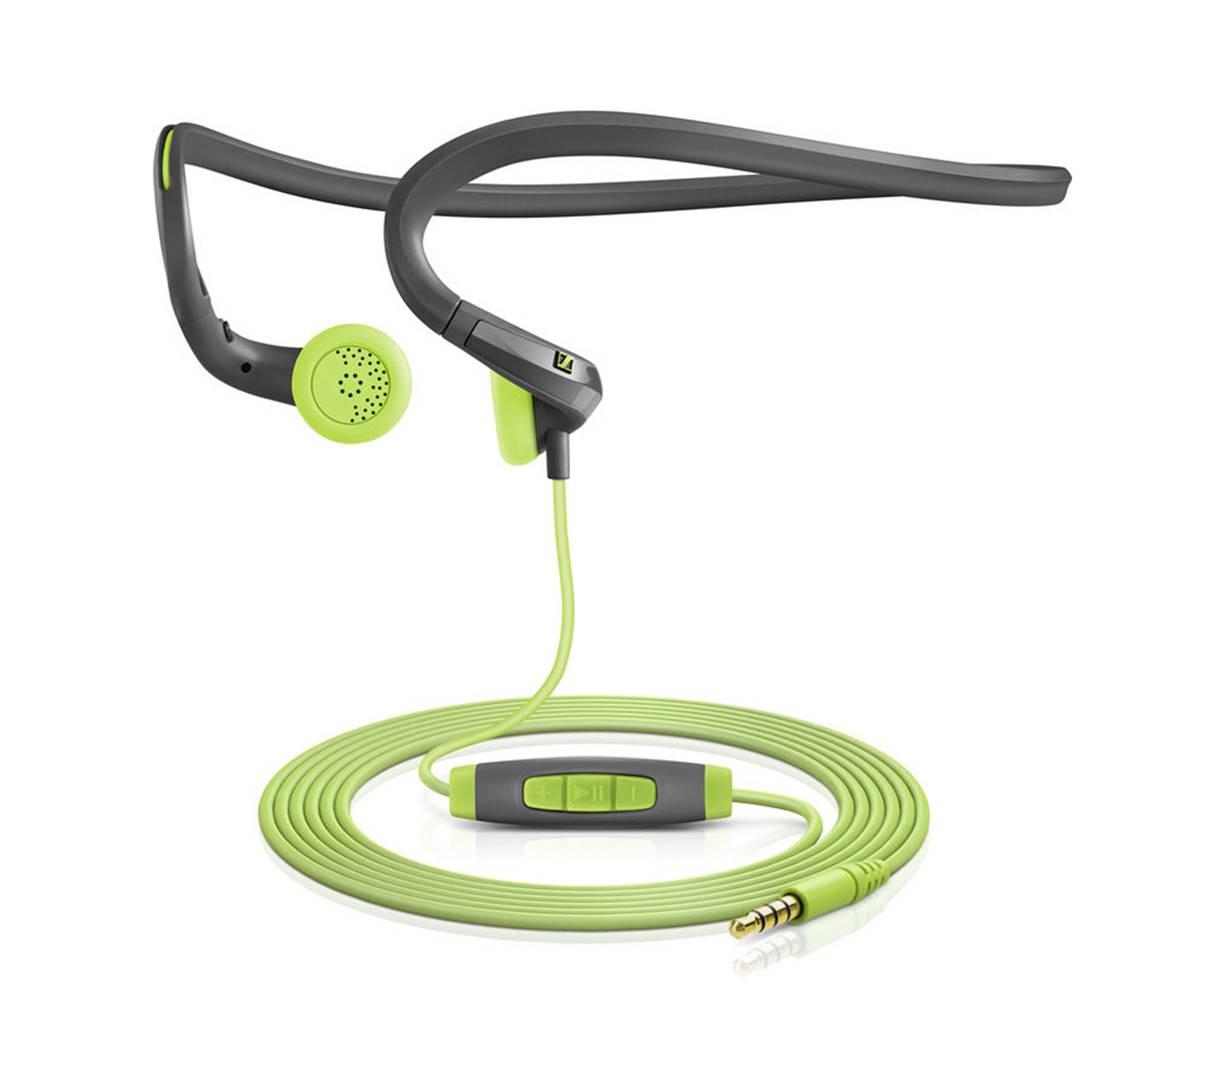 Sennheiser PMX 684i Workout Earbuds